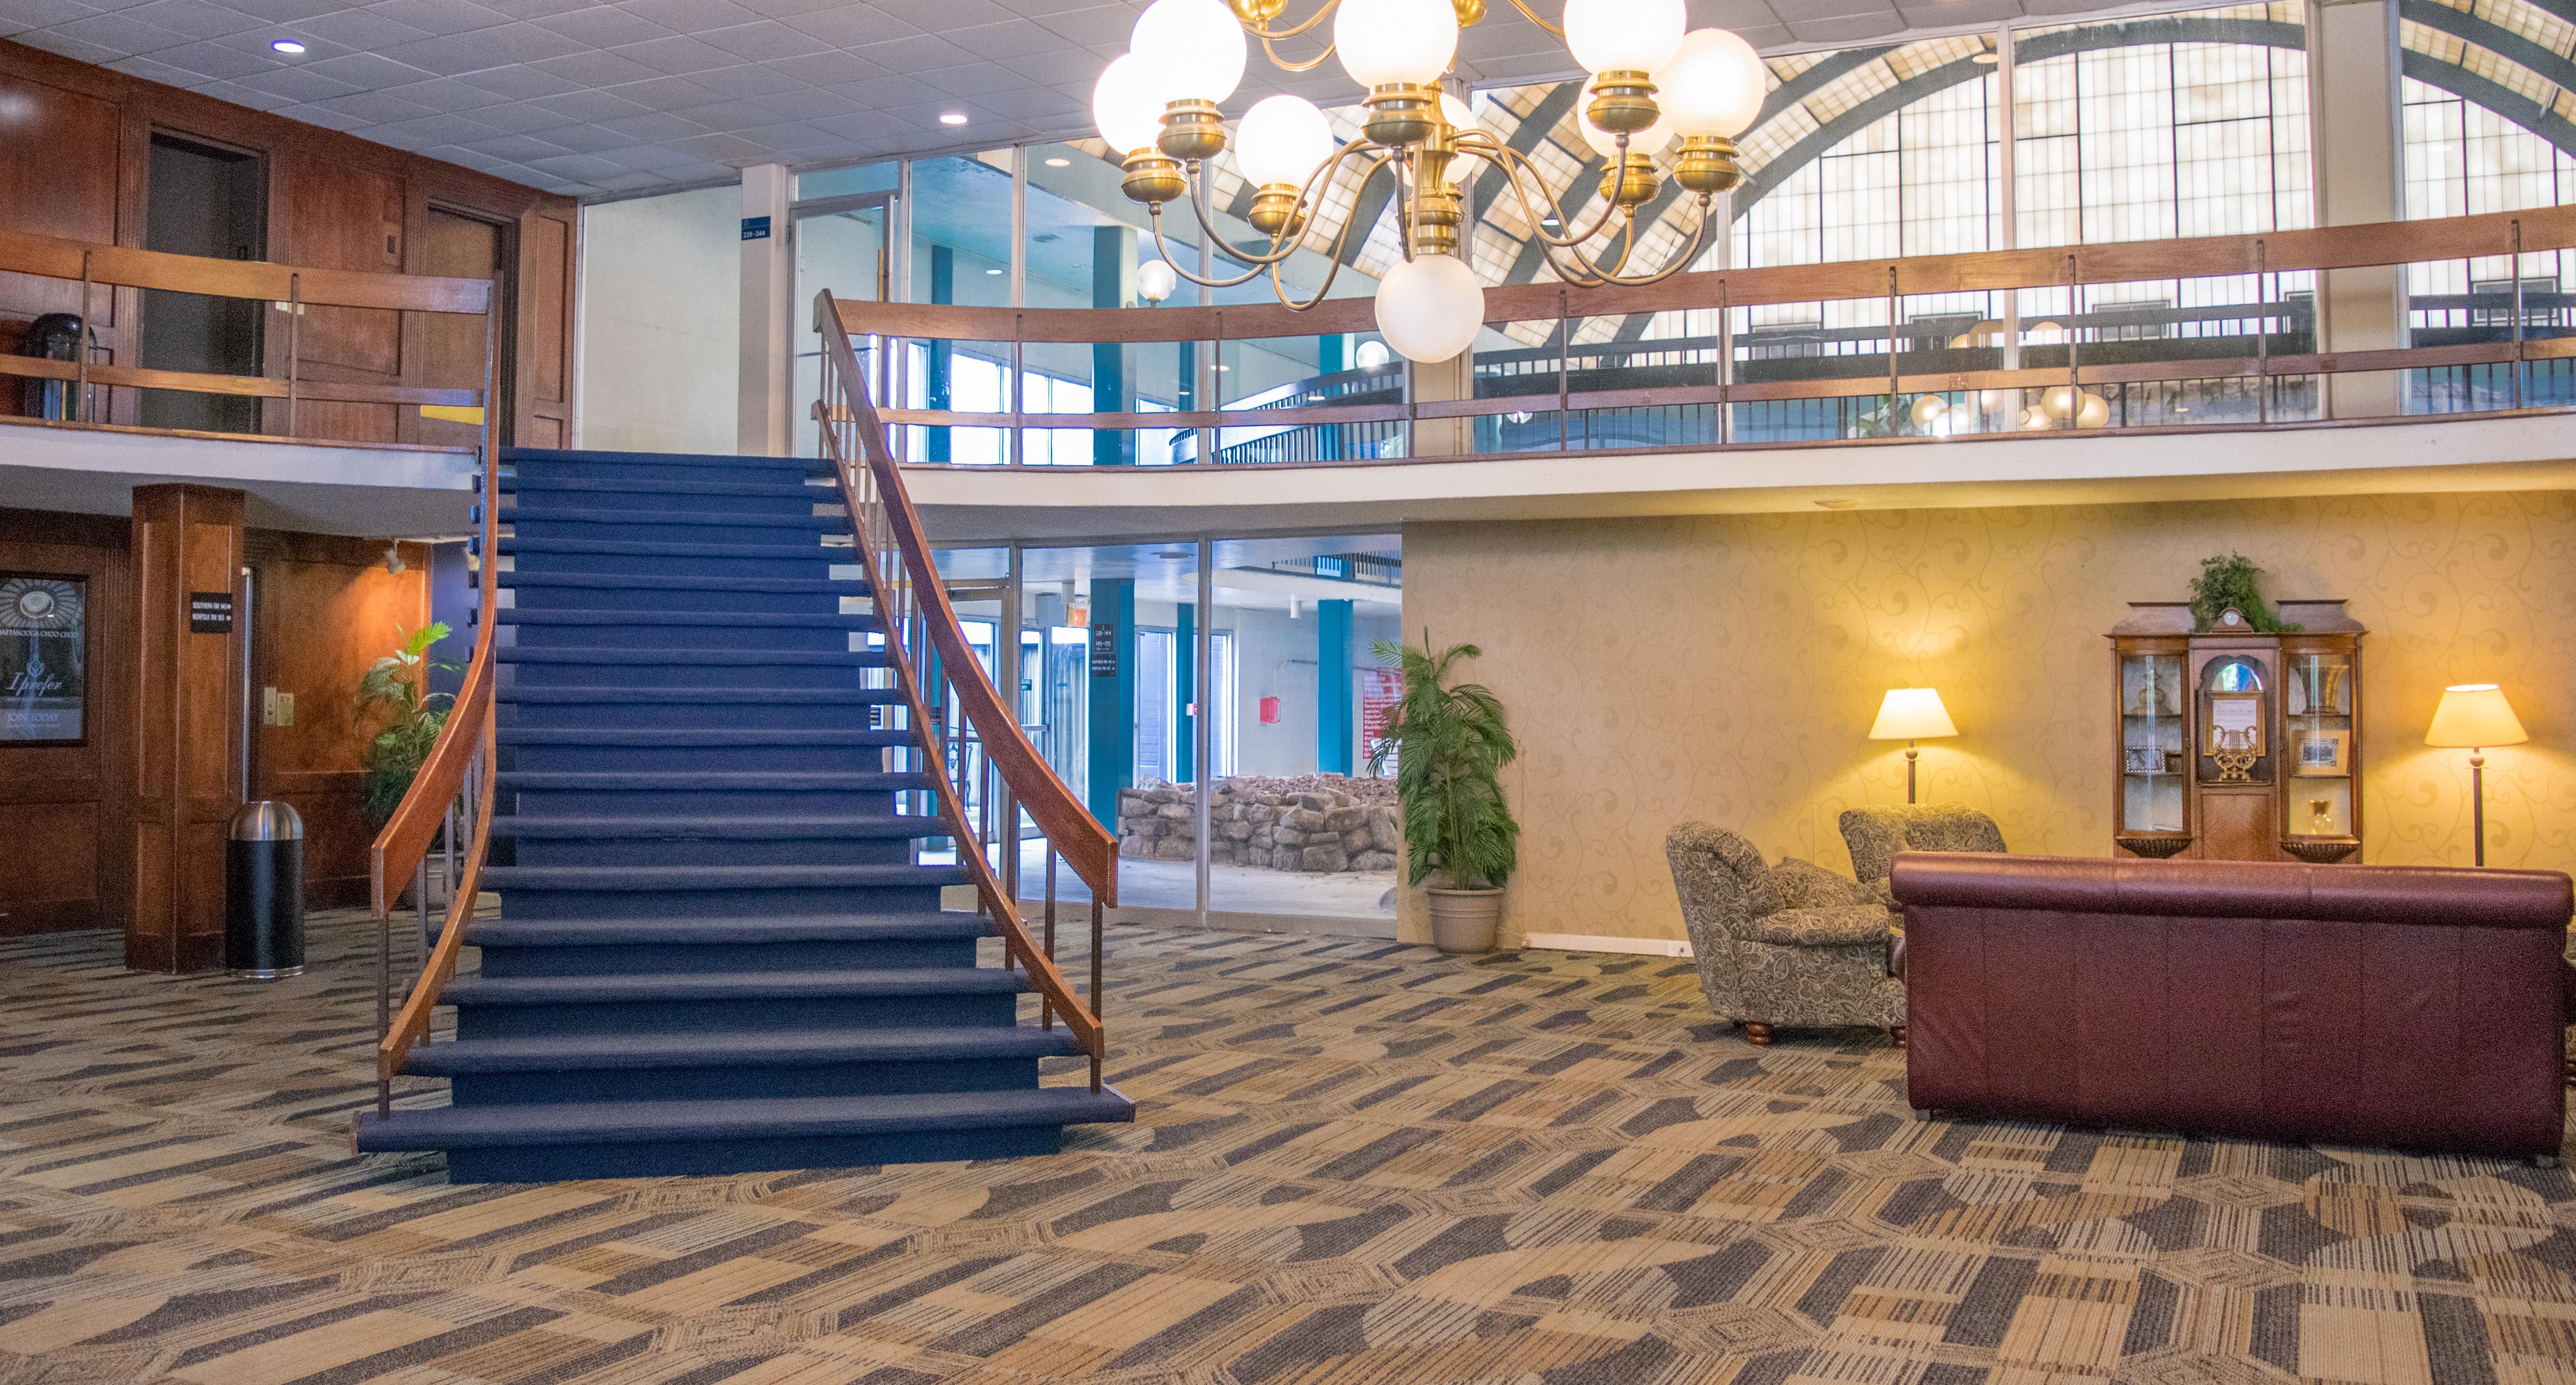 MacArthur Building Lobby - Chattanooga Choo Choo